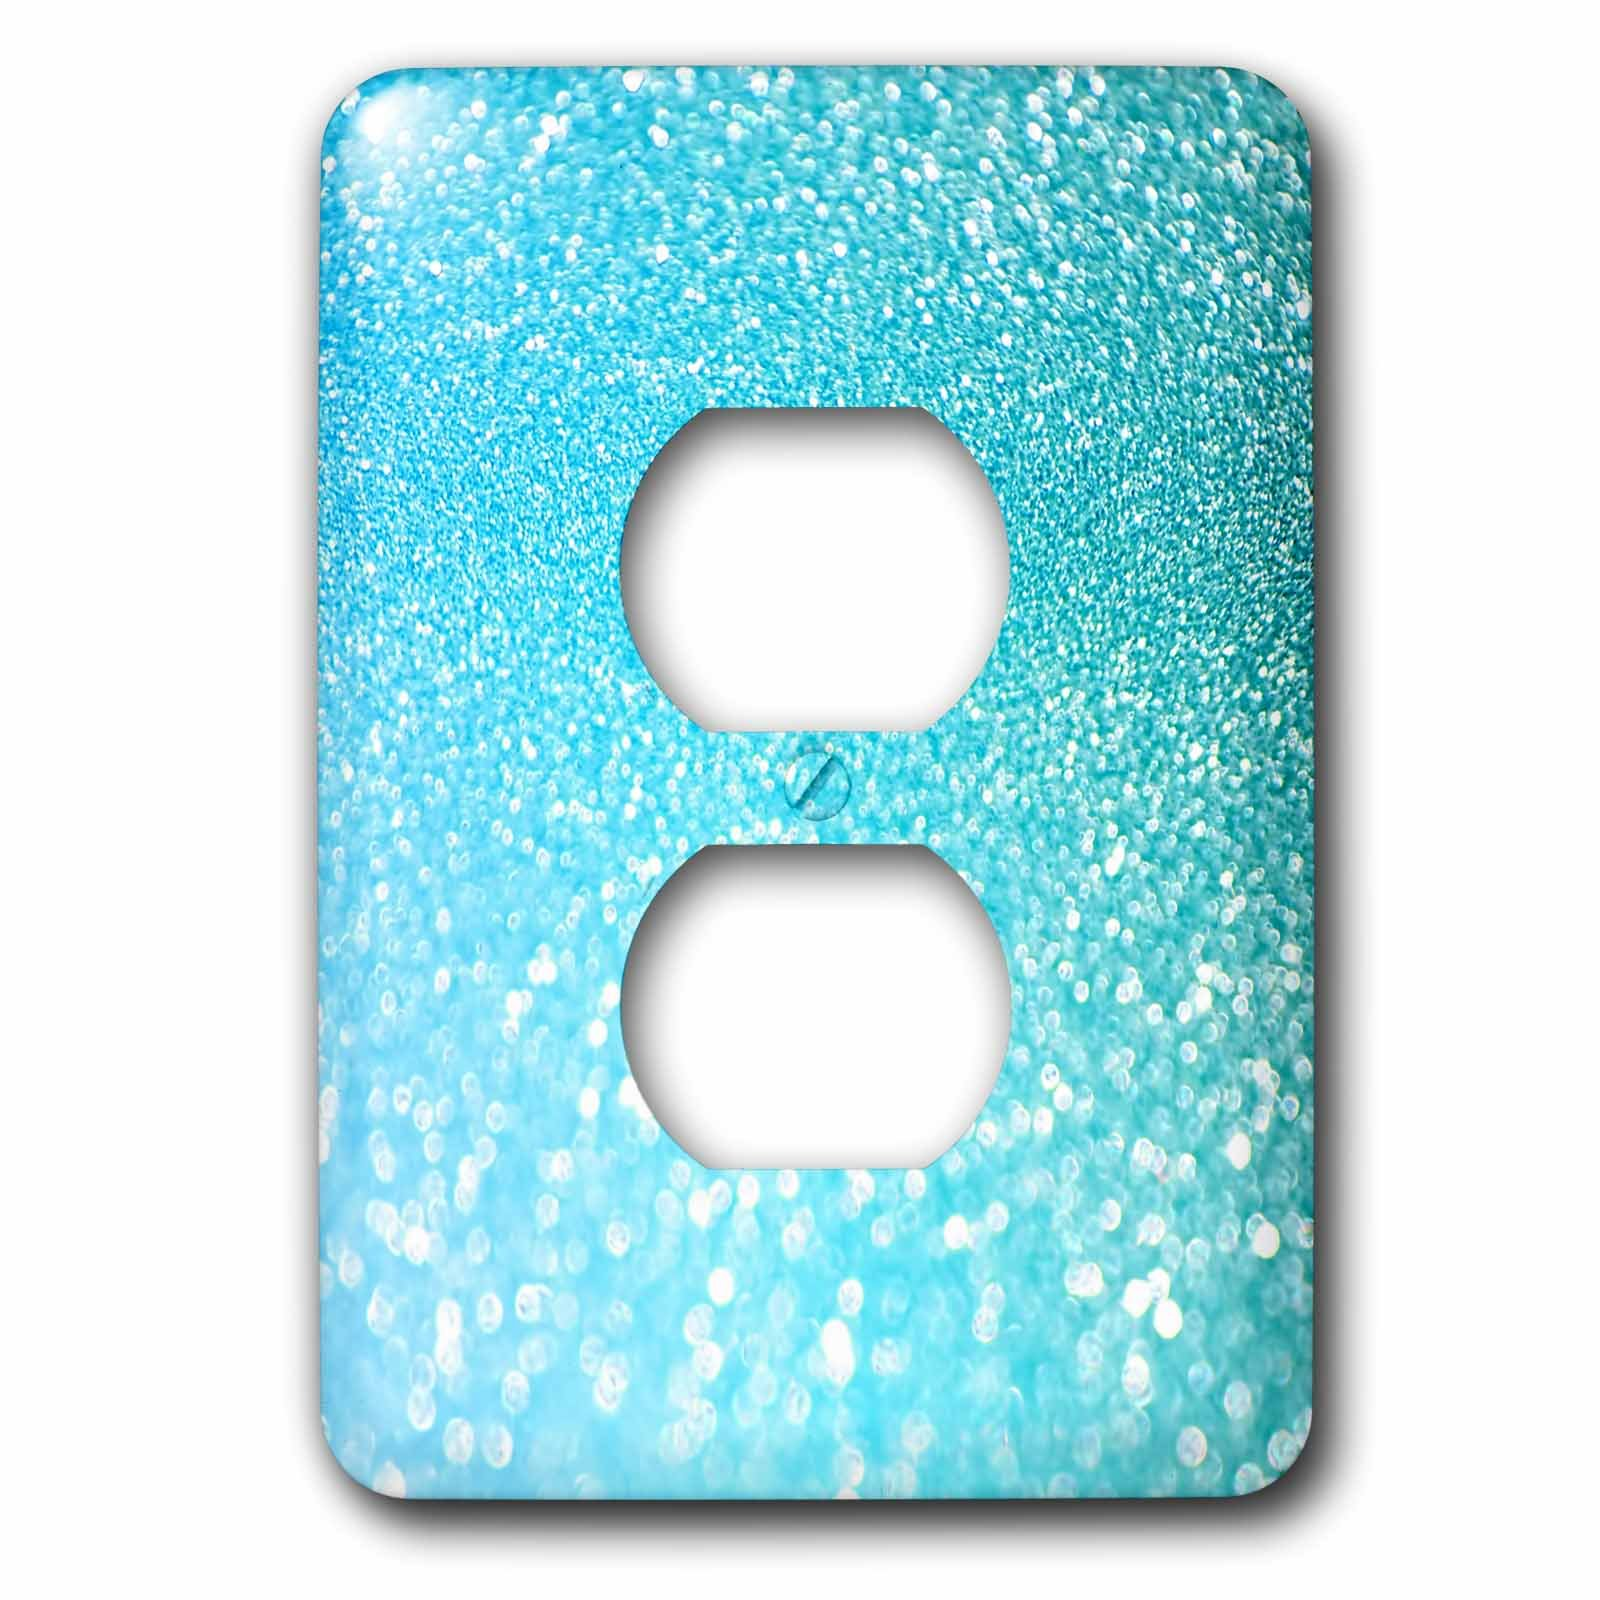 3dRose LSP_266925_6 Sparkling Beach Teal Luxury Elegant Mermaid Glitter Effect Art Print Plug Outlet Cover, Multicolor